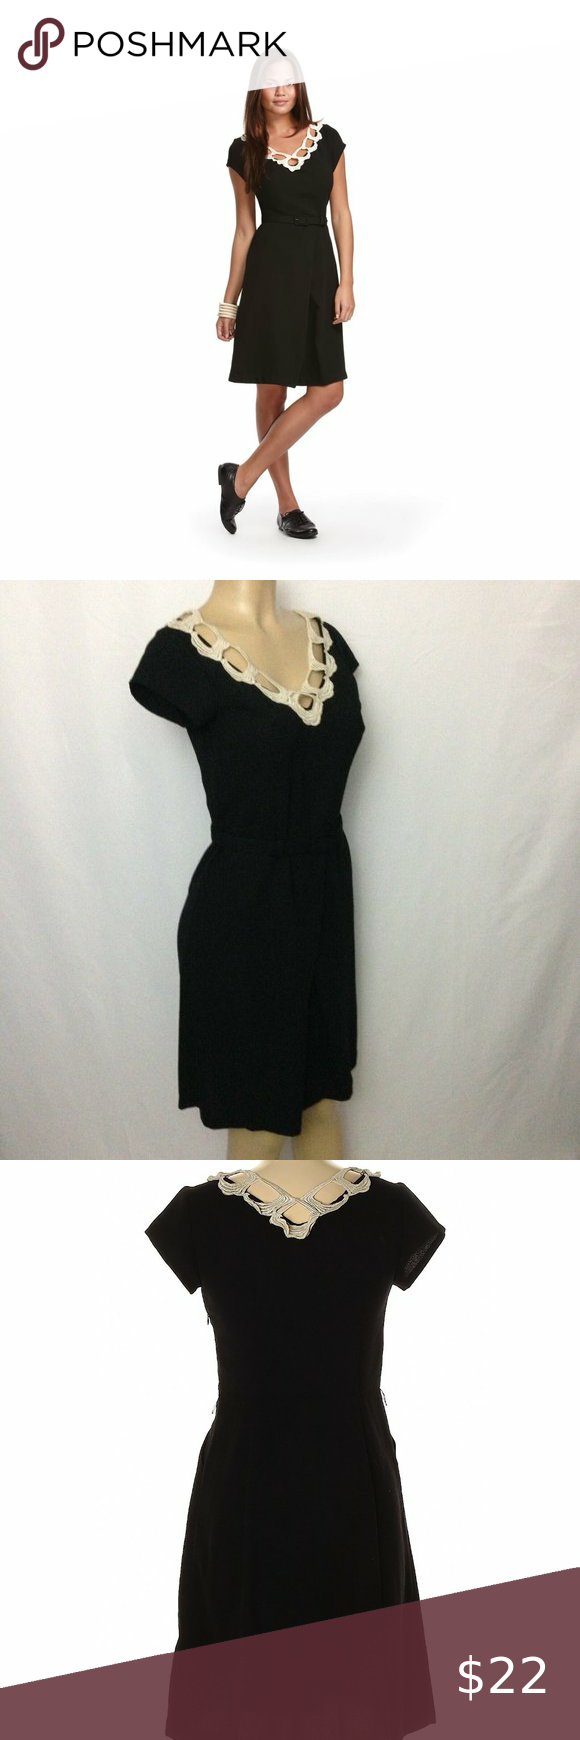 Libertine For Target Black Dress Size 11 Black Dress Dresses Short Sleeve Dresses [ 1740 x 580 Pixel ]